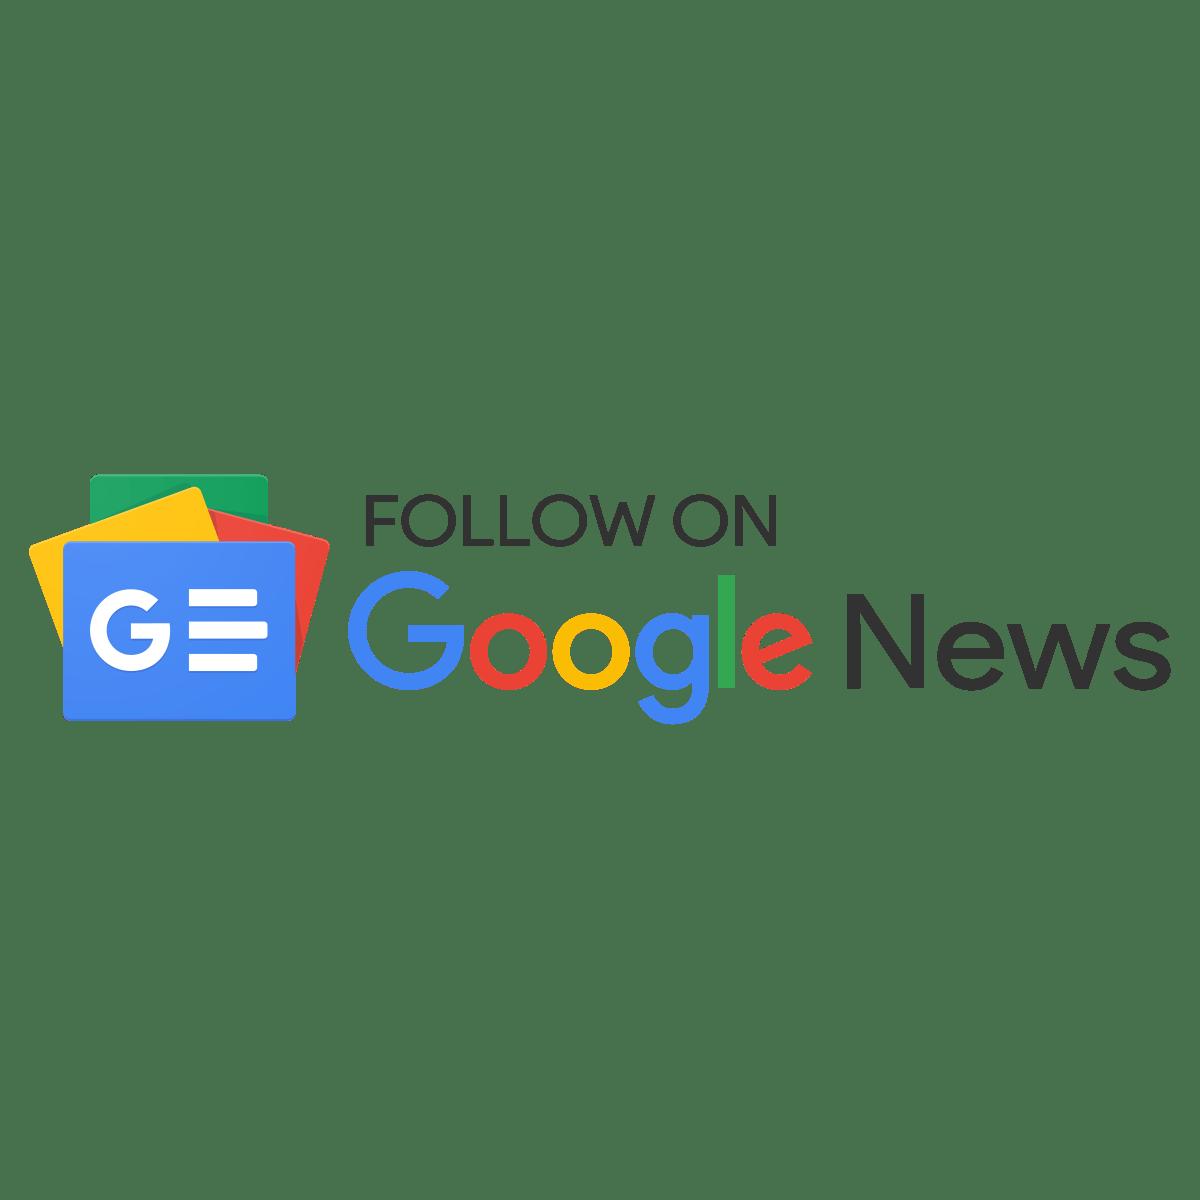 Follow on Google News Transparent Clipart